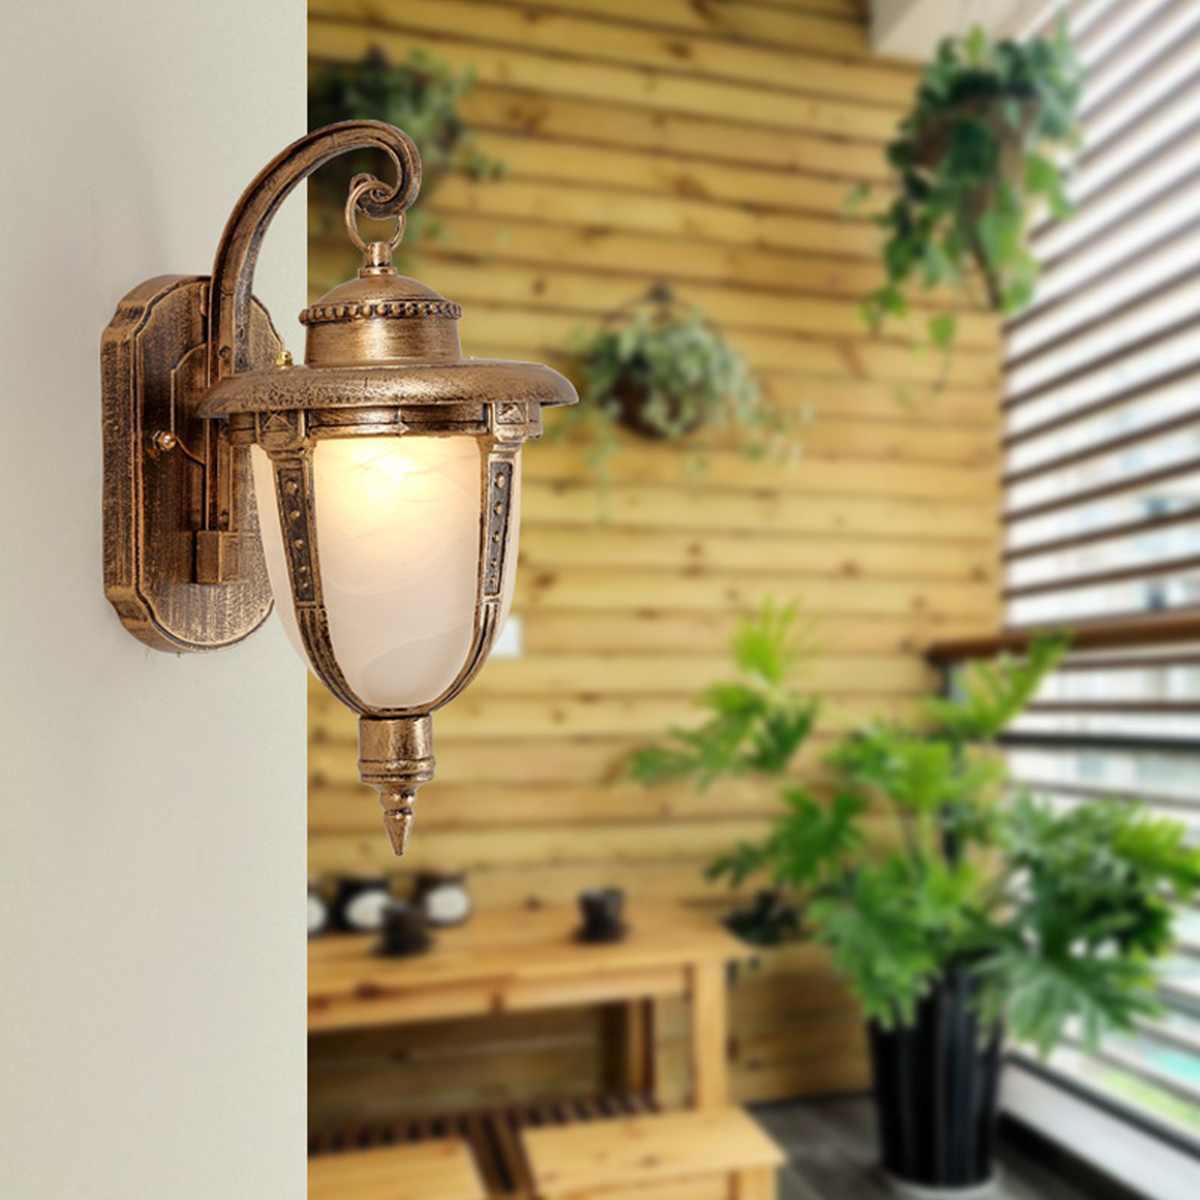 Vintage Garden  Exterior Vintage Outdoor Hanging Lantern Pendant Light Garden Porch Home Hallway Garage LampVintage Garden  Exterior Vintage Outdoor Hanging Lantern Pendant Light Garden Porch Home Hallway Garage Lamp